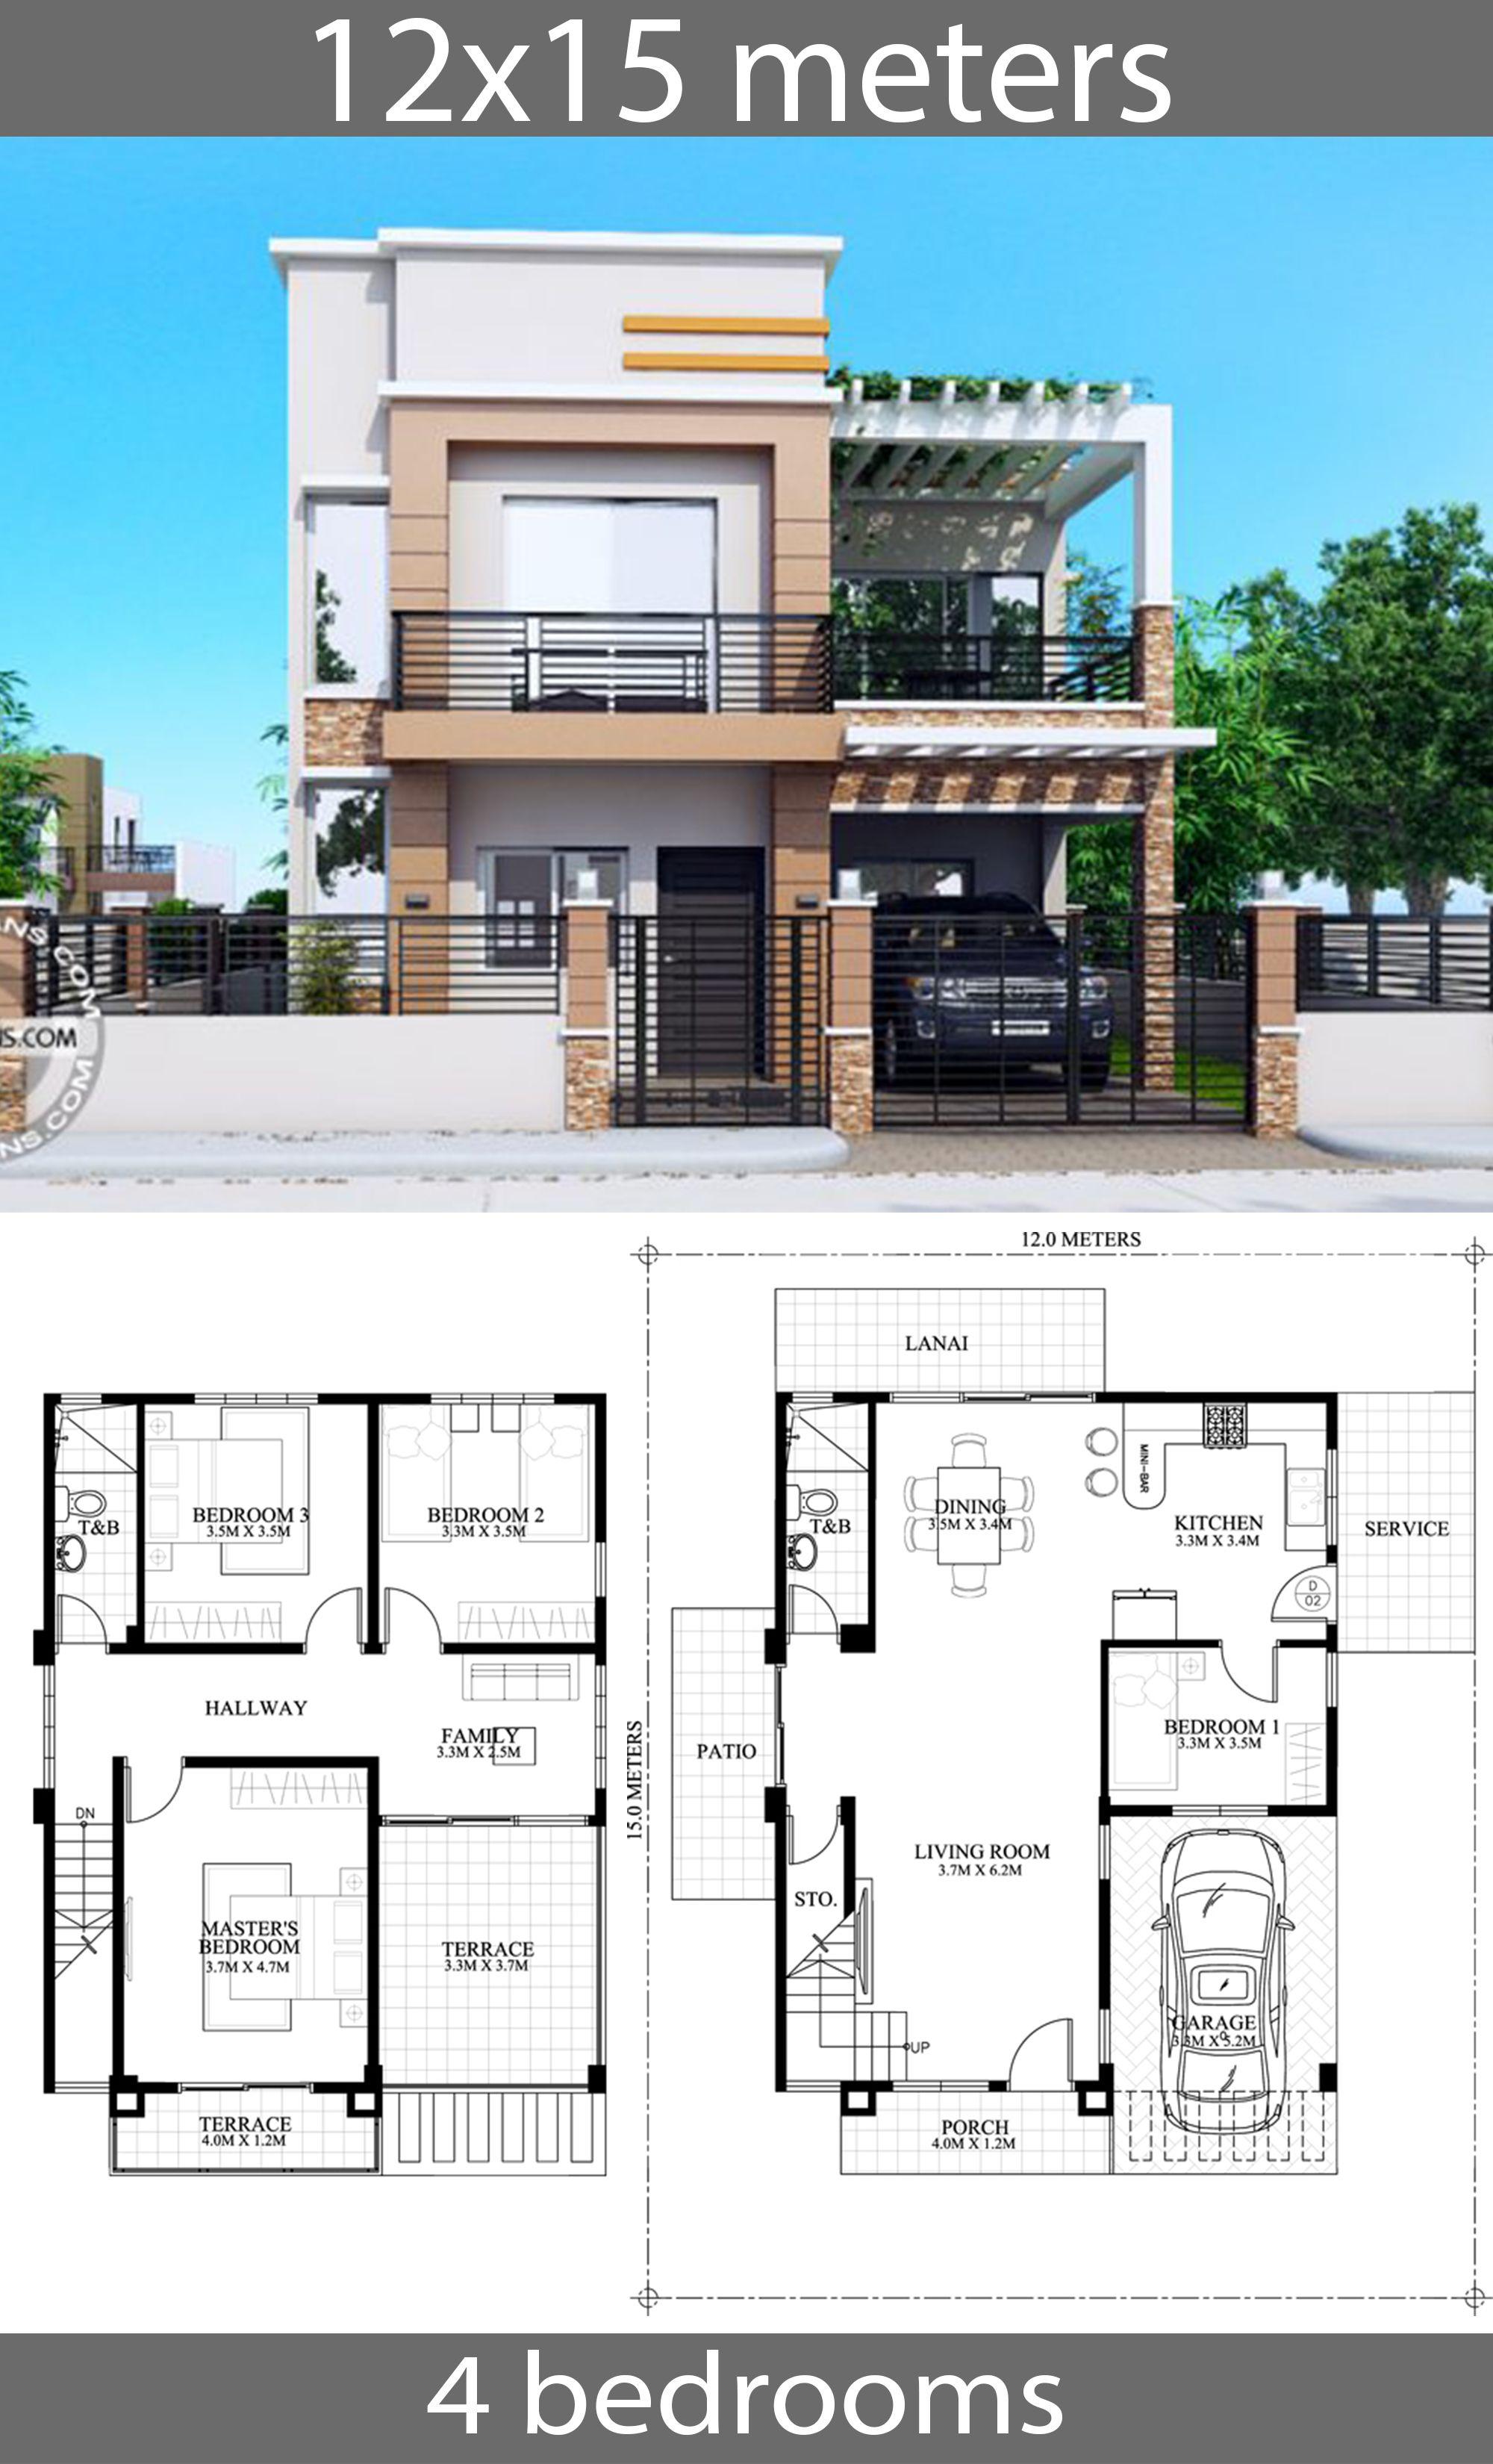 House Plans 12x15m With 4 Bedrooms House Idea In 2020 Duplex House Design House Construction Plan Dream House Plans